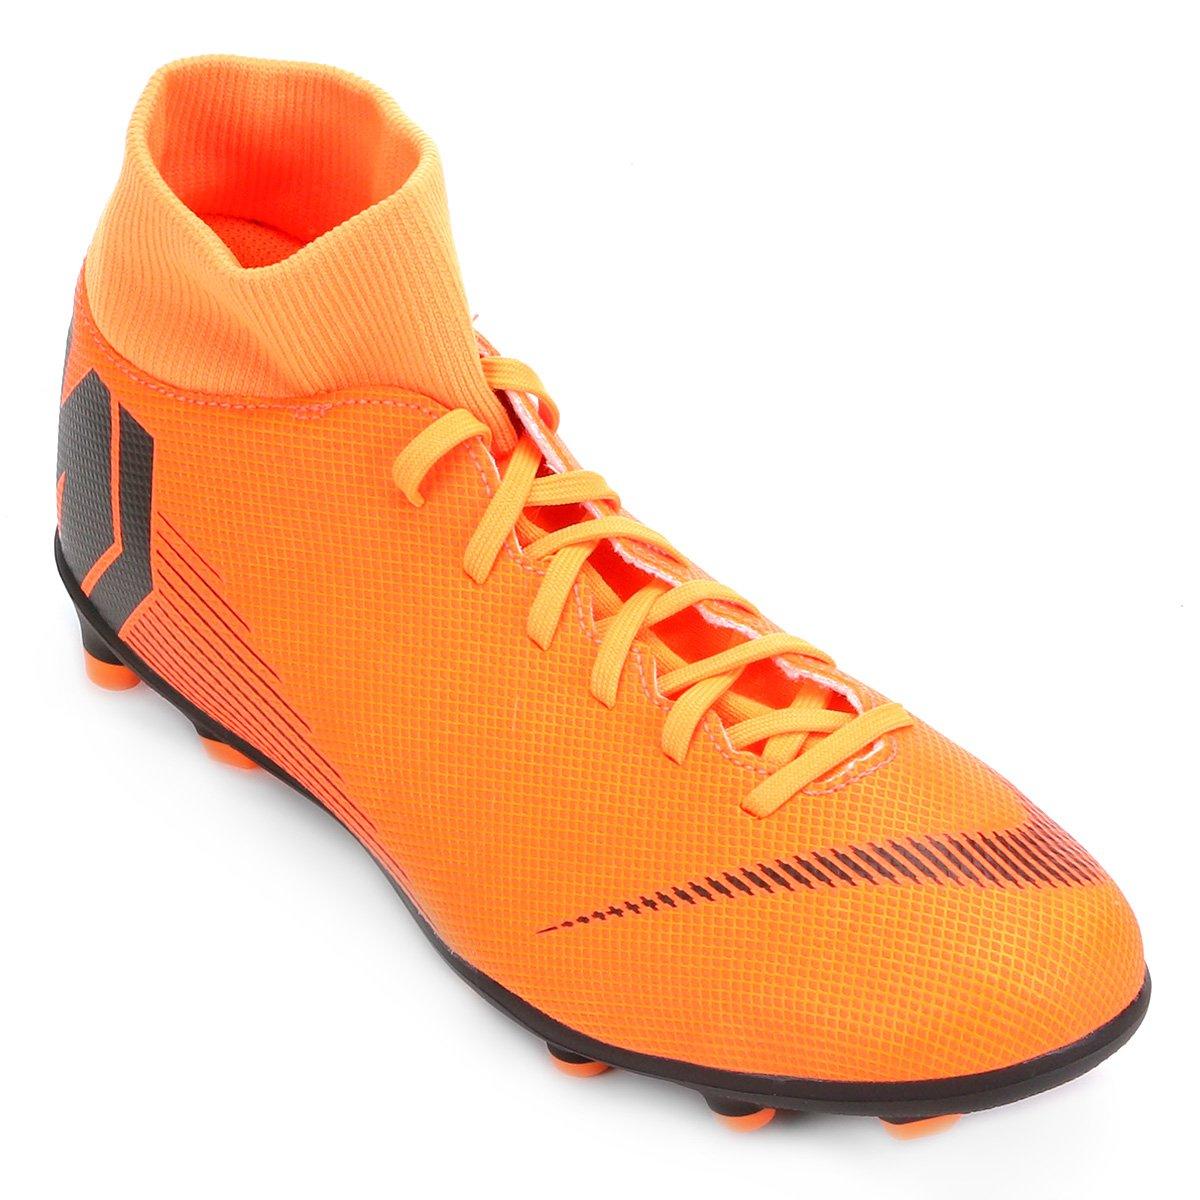 8a18f2adc7 Chuteira Campo Nike Mercurial Superfly 6 Club